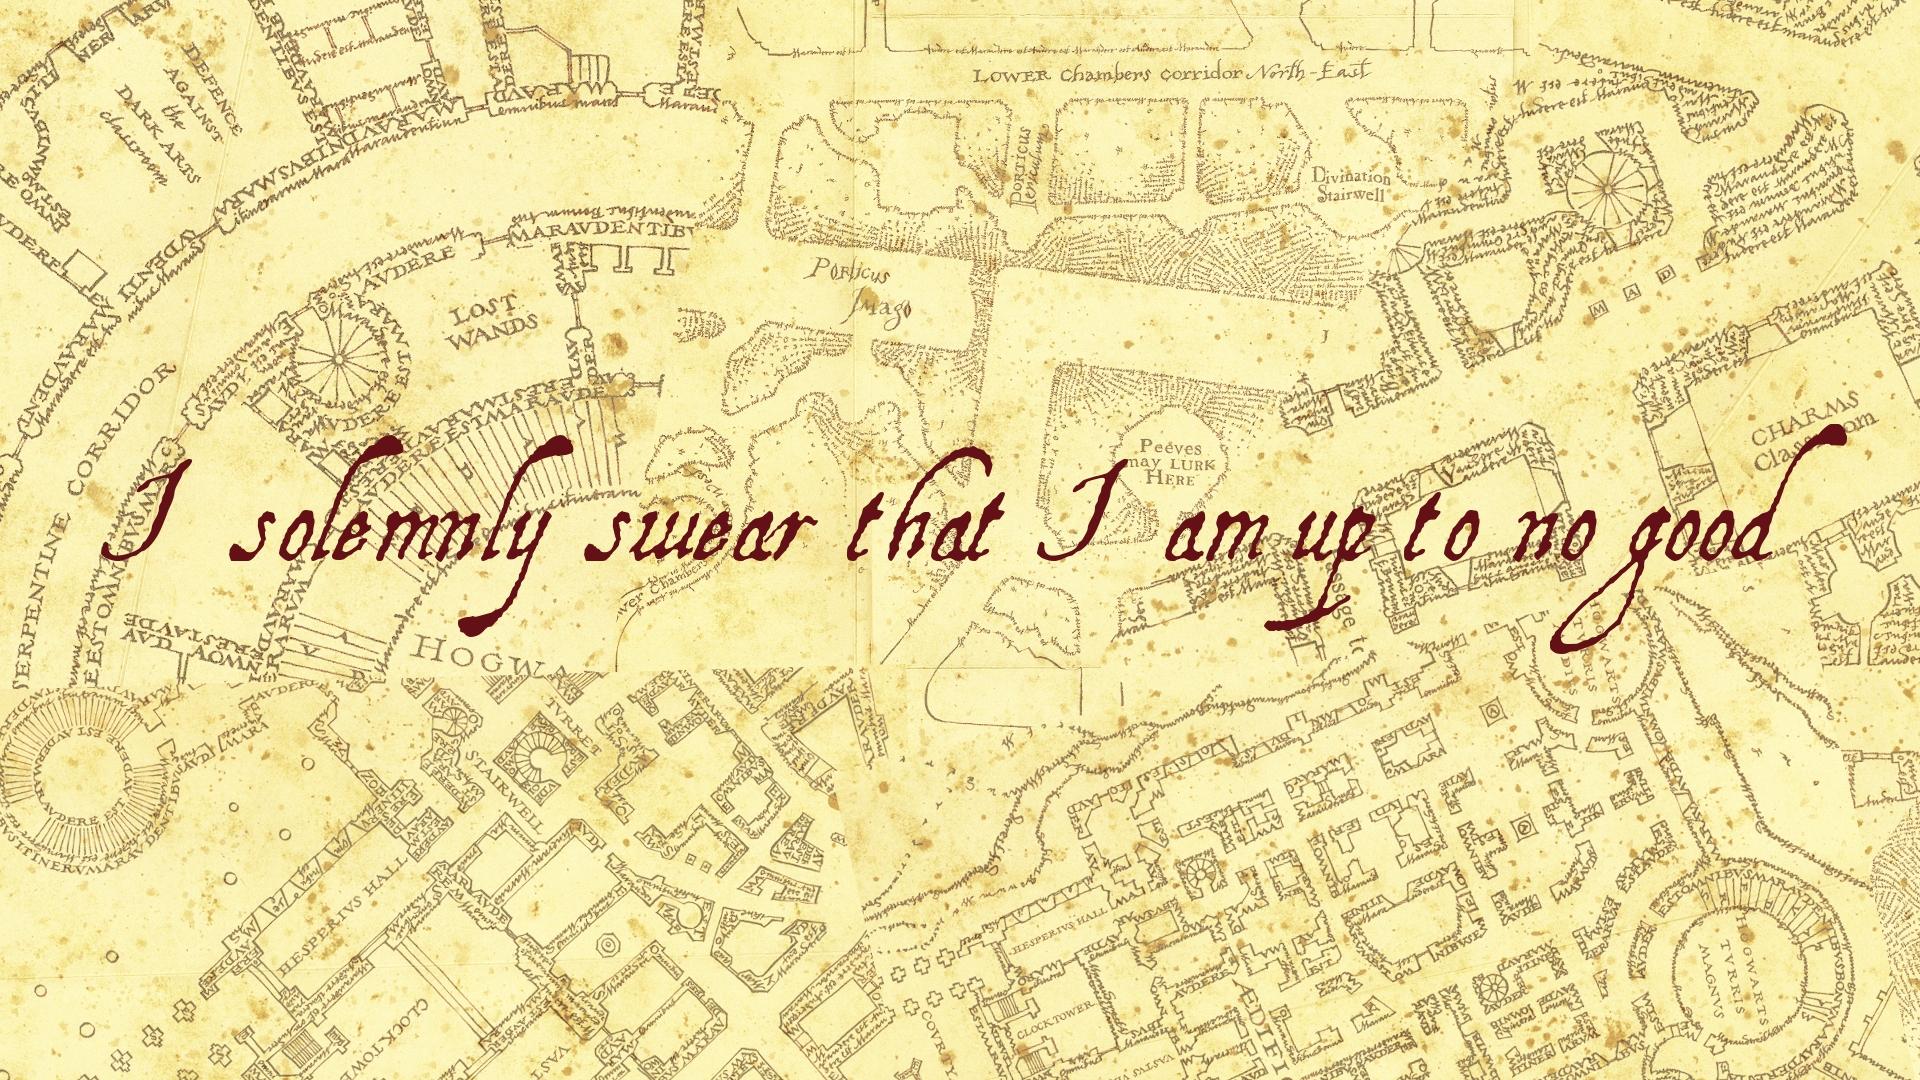 Fantastic Wallpaper Harry Potter Simple - harry-potter-quotes-wallpapers-wallpaper-cave-1  You Should Have_232278.png